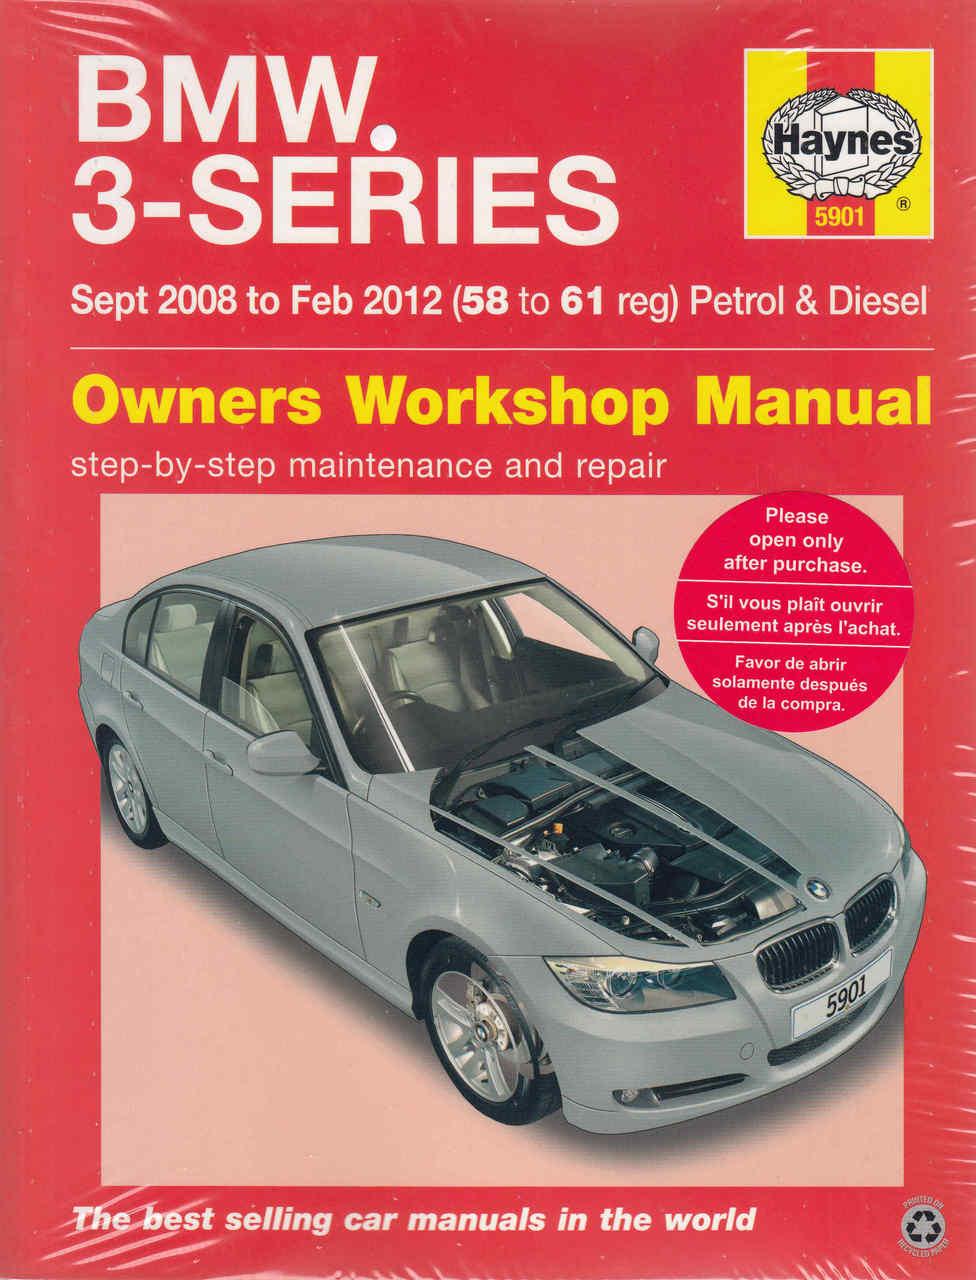 BMW 3 Series E90 / E91 Sept 2008 - Feb 2012 Petrol & Diesel Workshop Manual